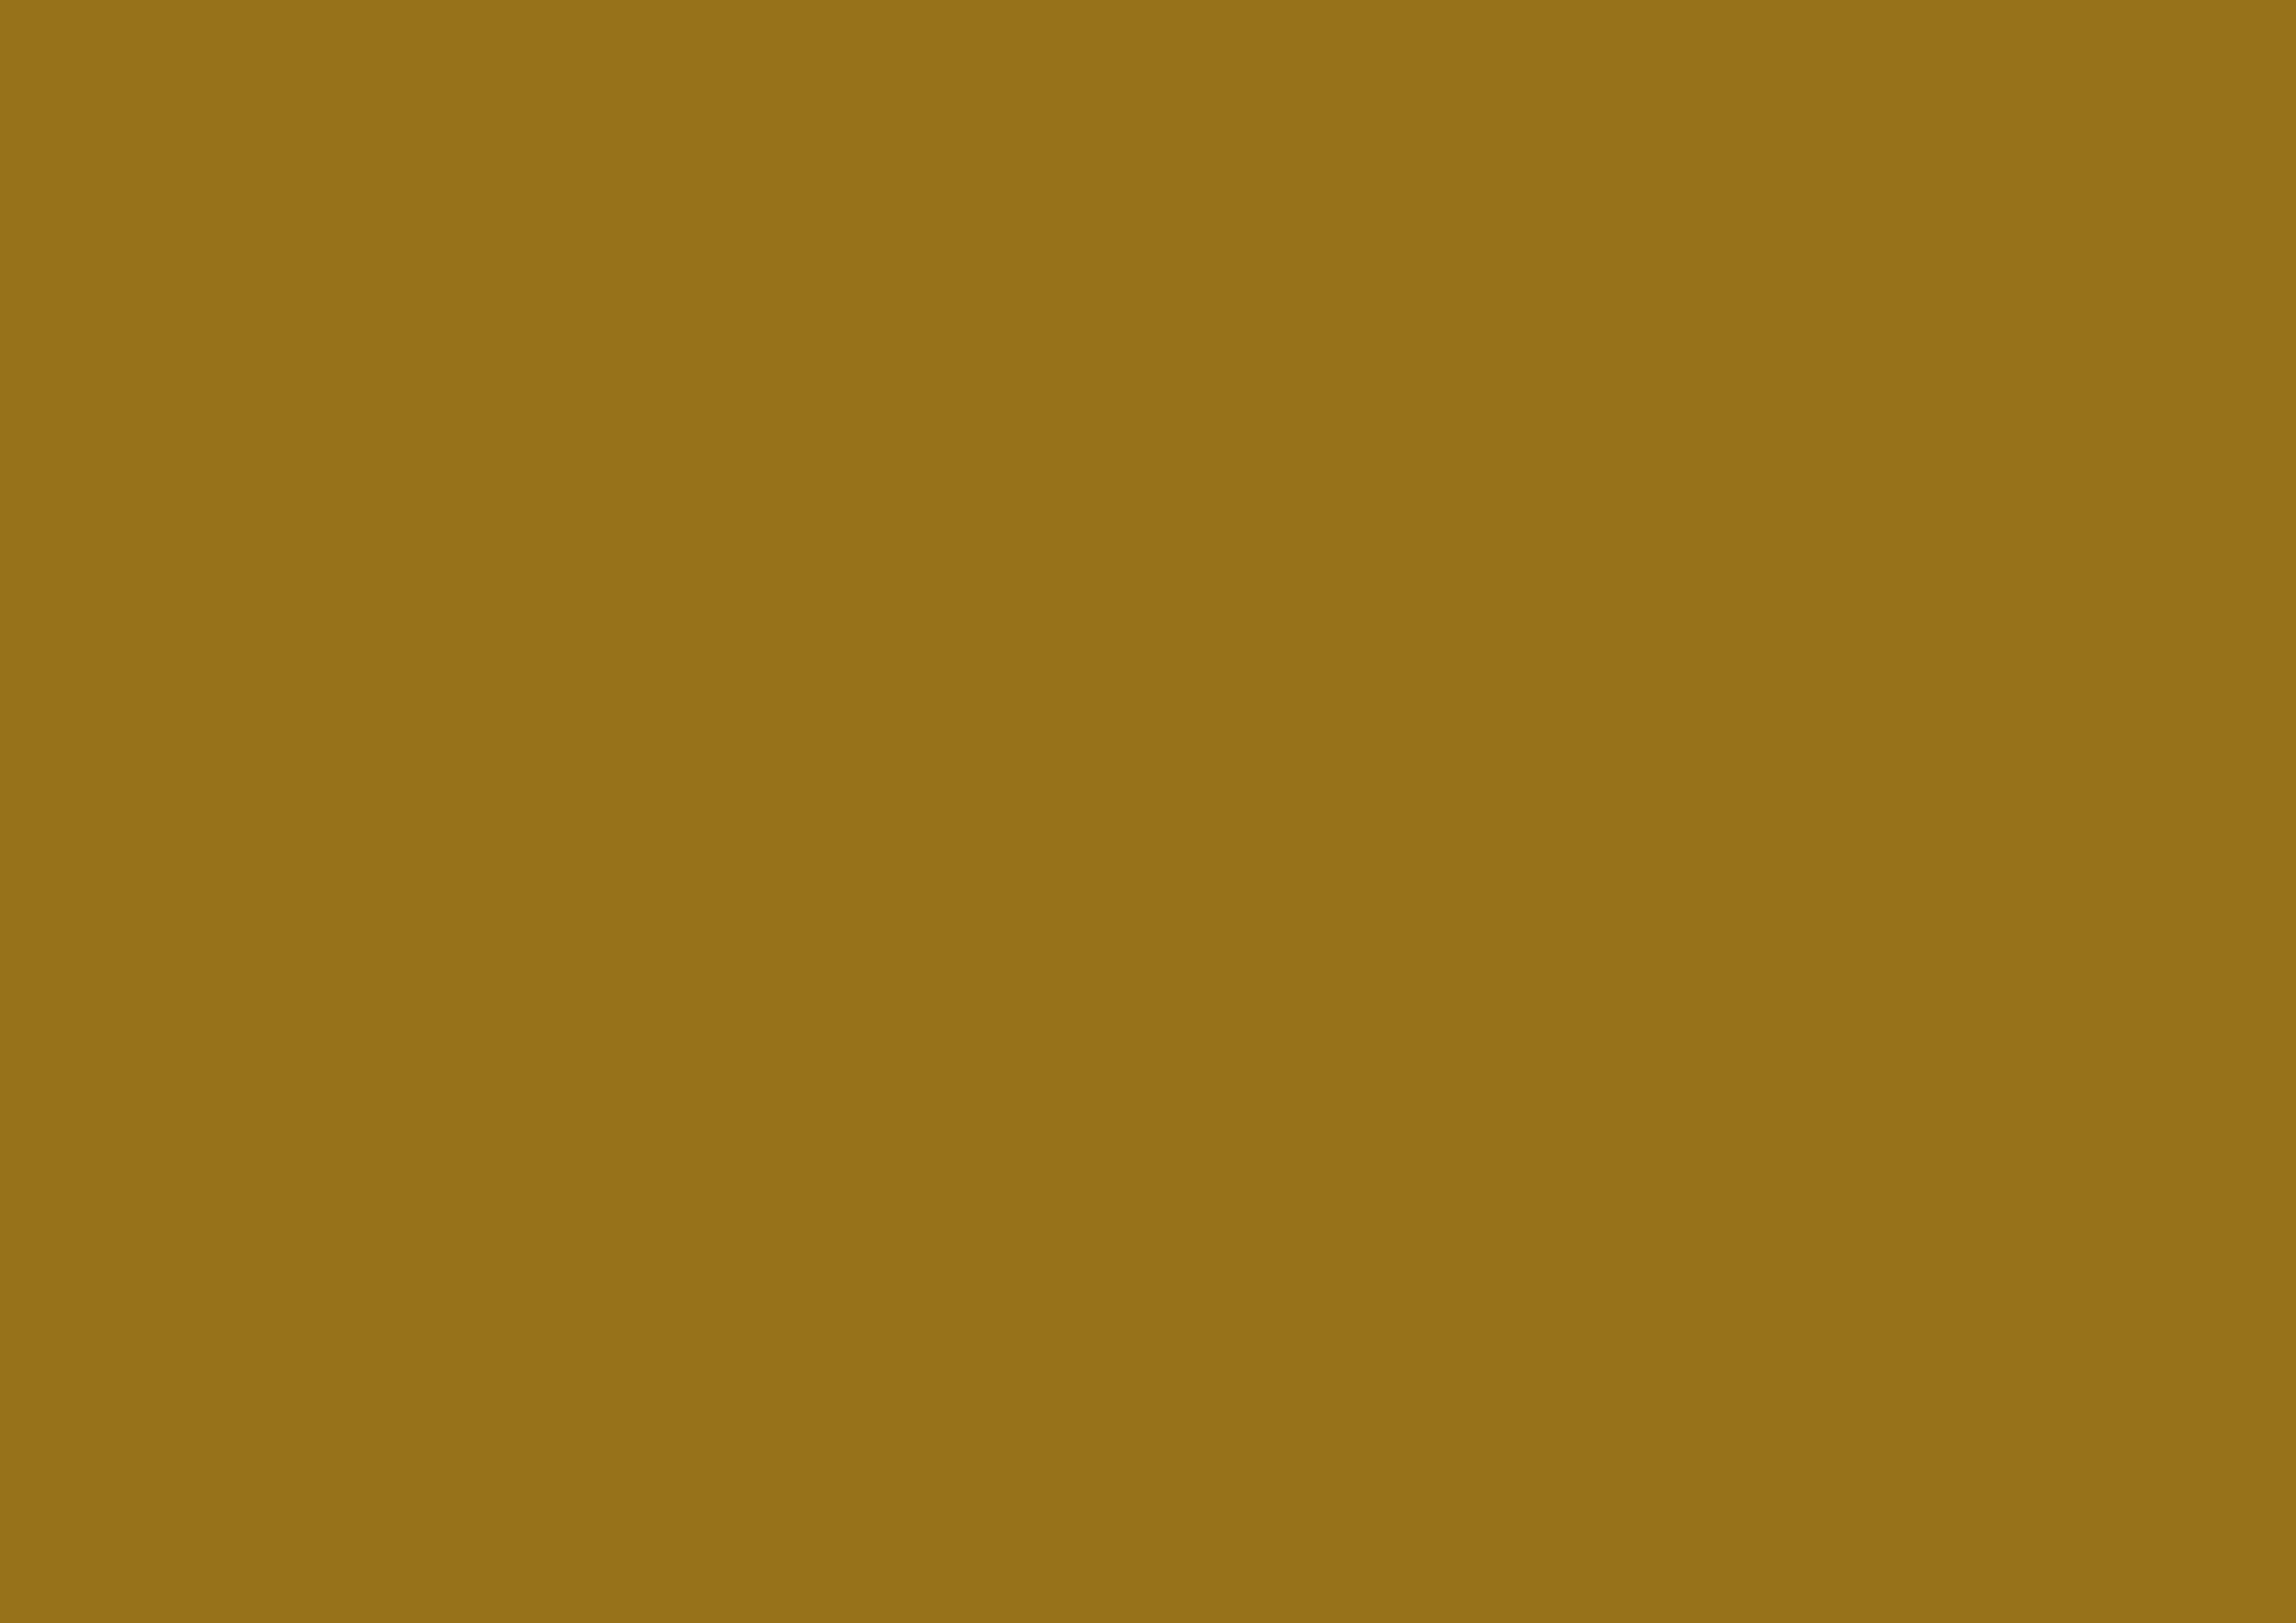 3508x2480 Bistre Brown Solid Color Background